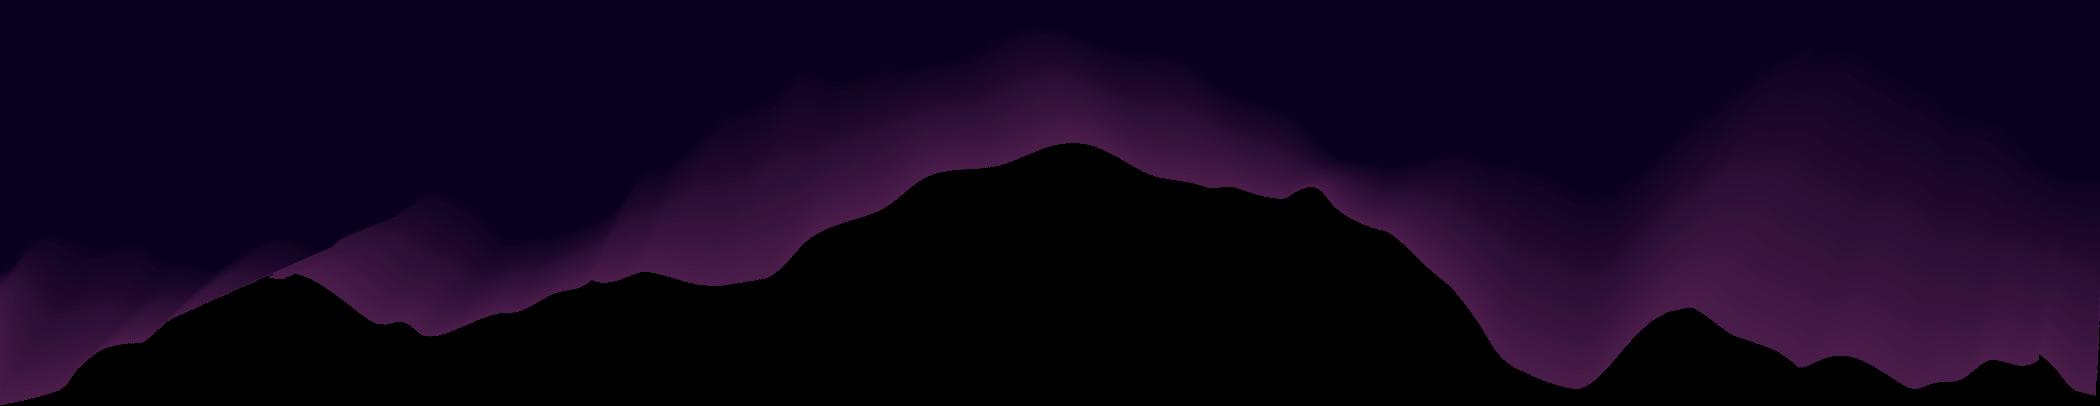 https://stellarium.bold-themes.com/color/wp-content/uploads/sites/5/2018/05/dark_purple_bottom_divider.png